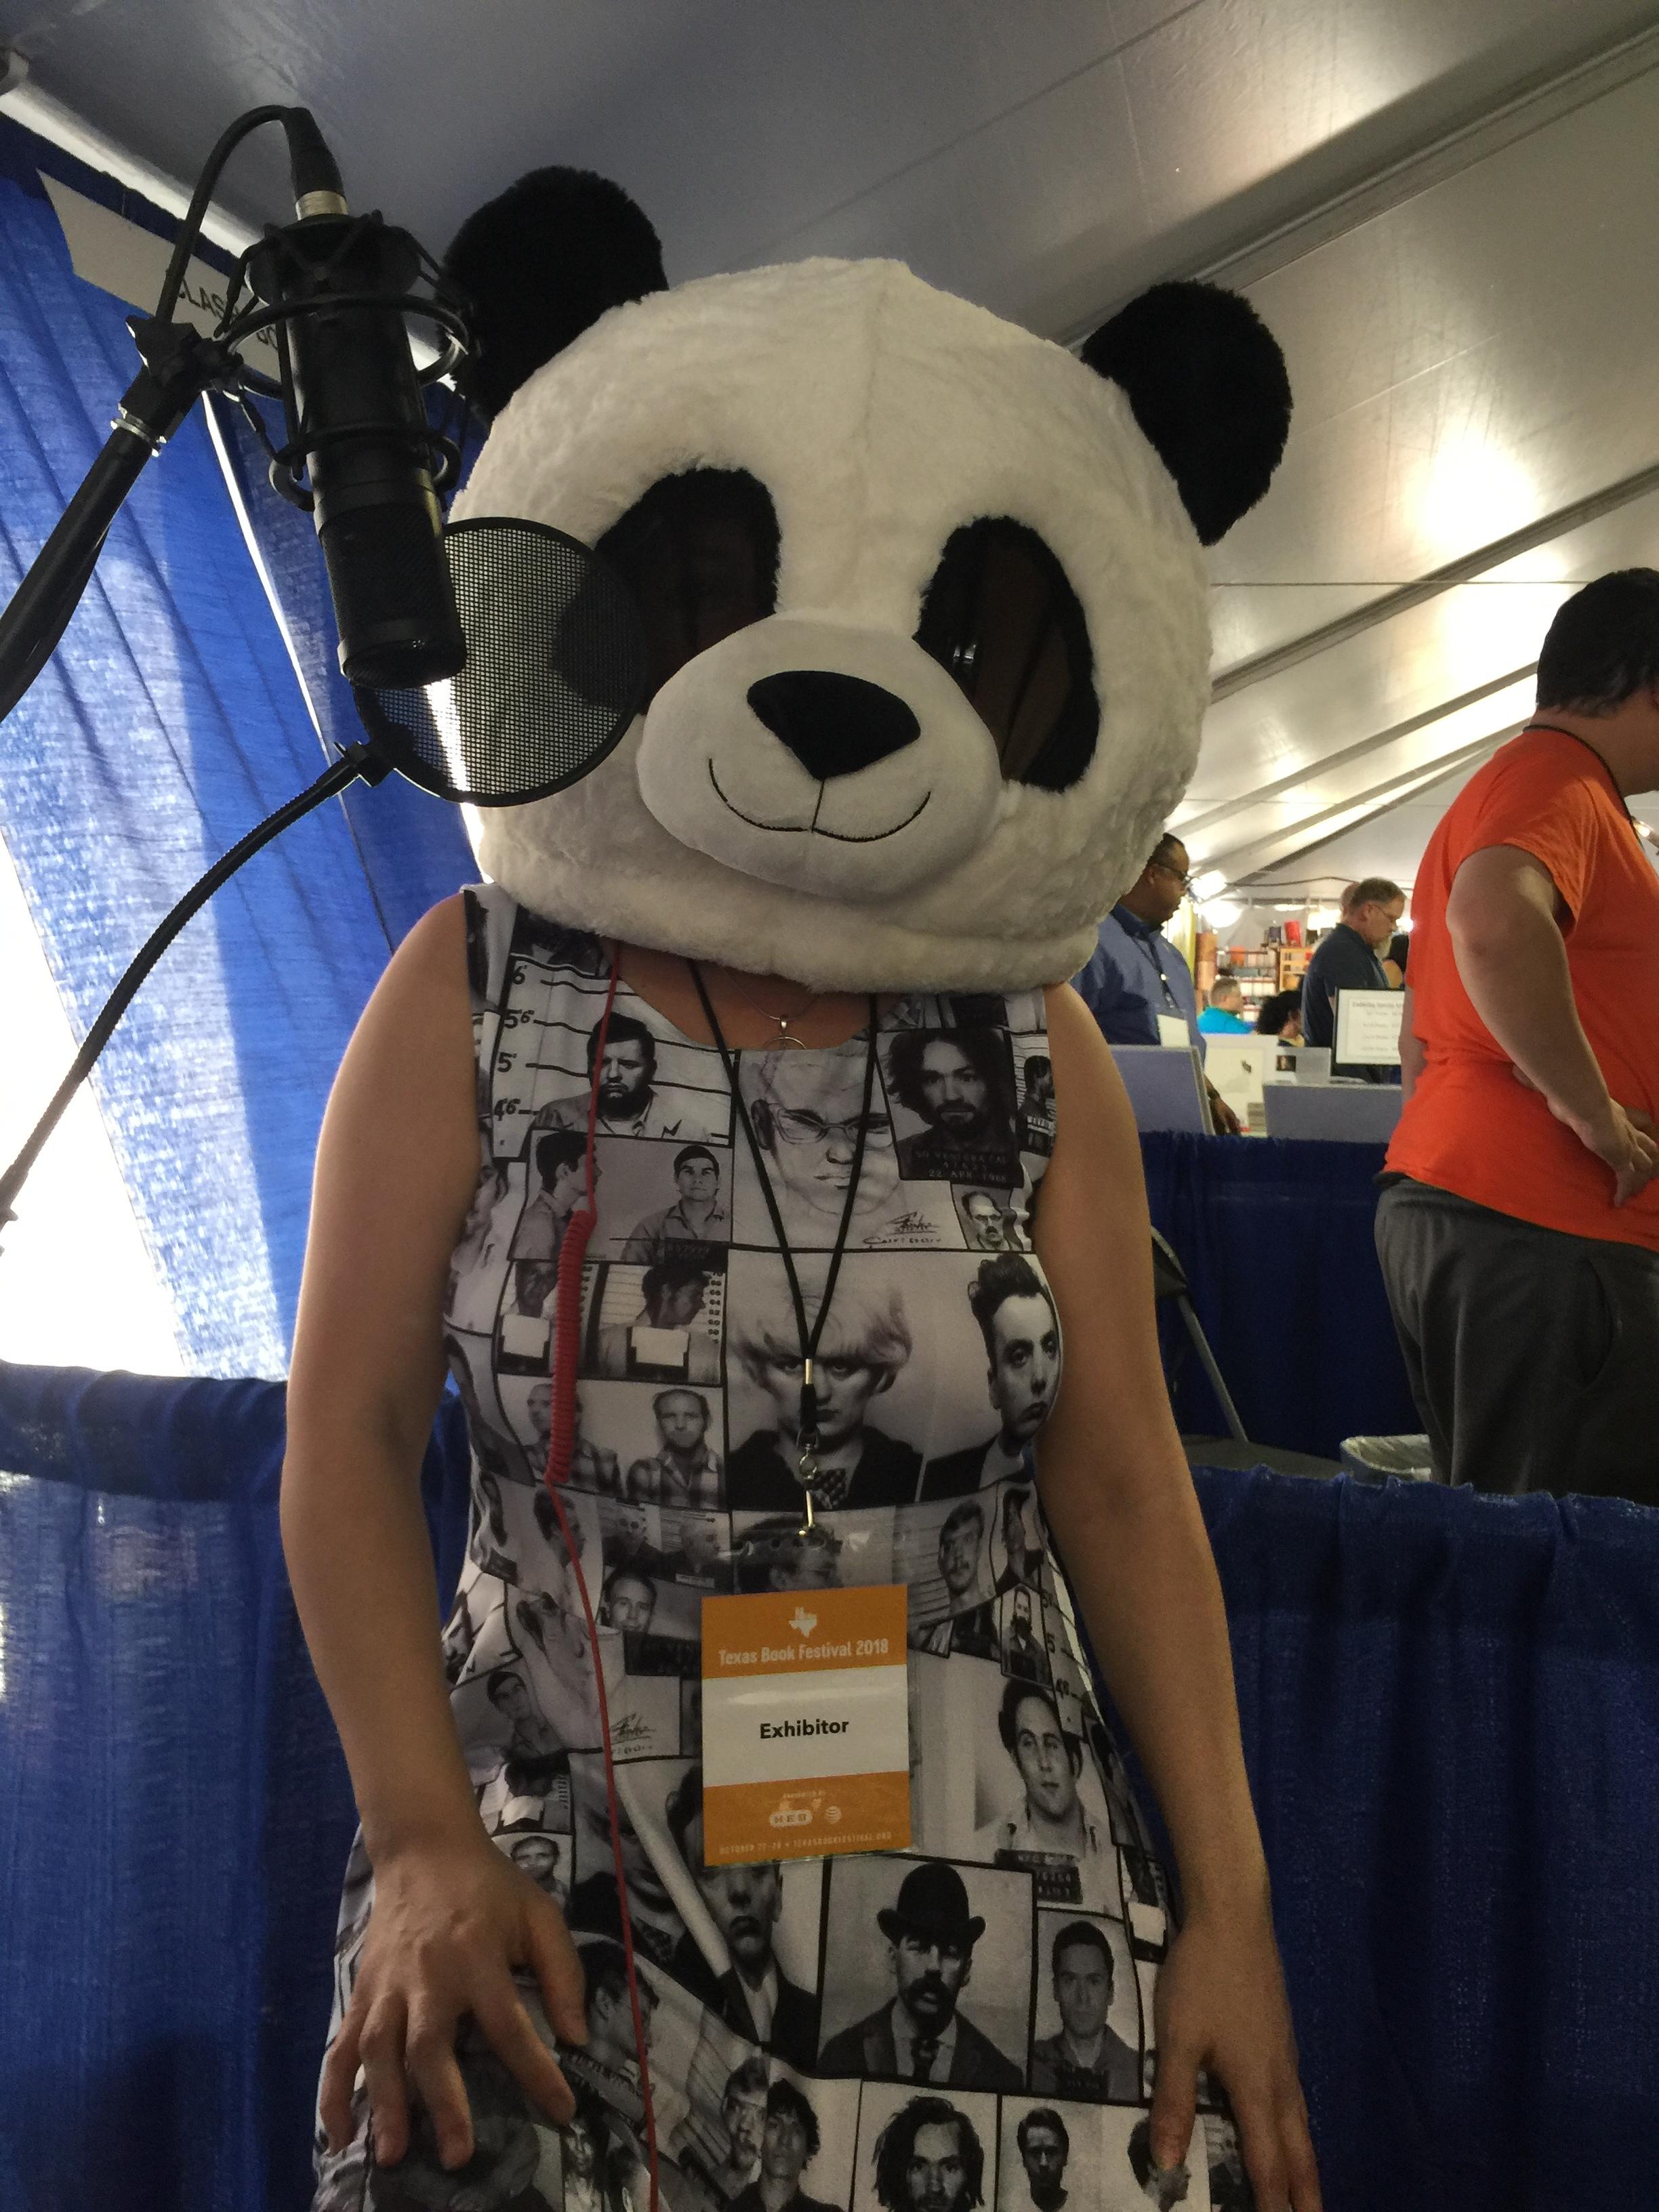 Leza Cantoral, author and panda